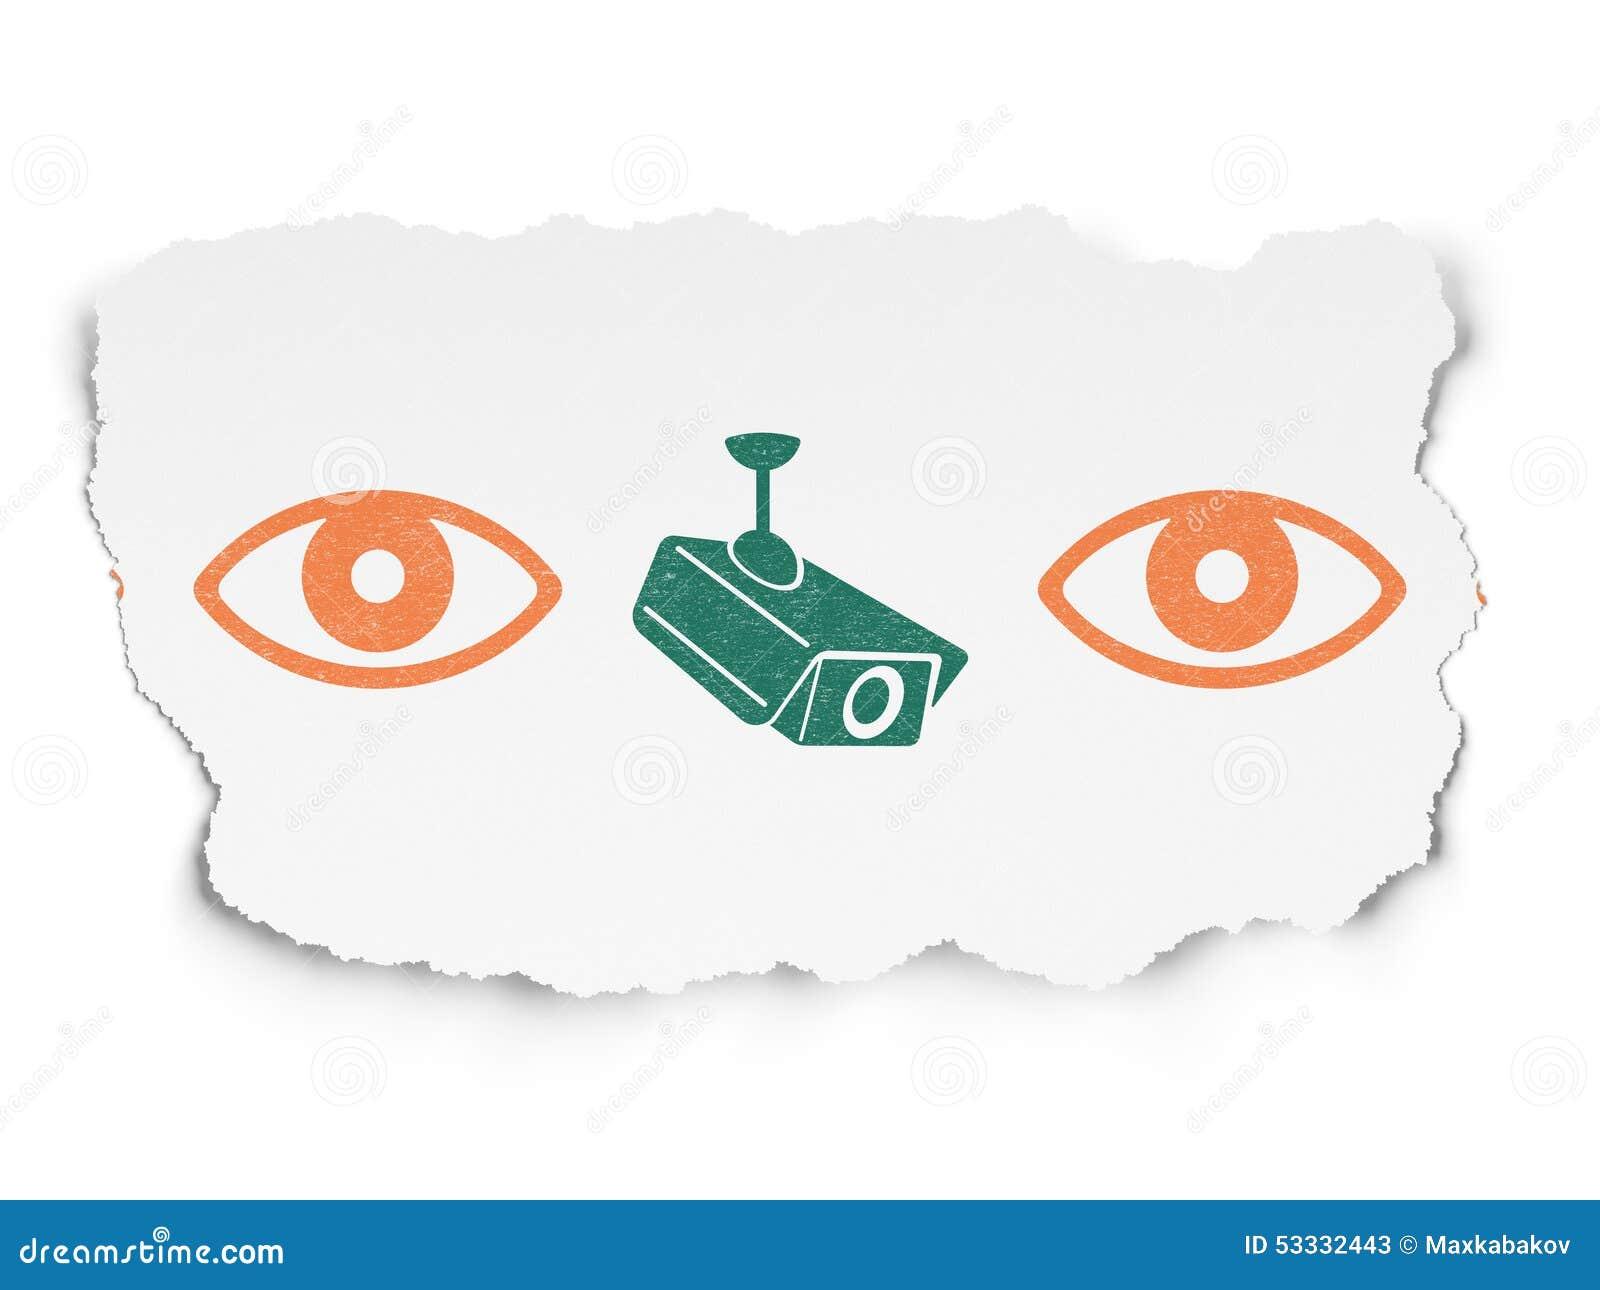 CCTV Camera Papercraft   Papercraft Paradise   PaperCrafts   Paper ...